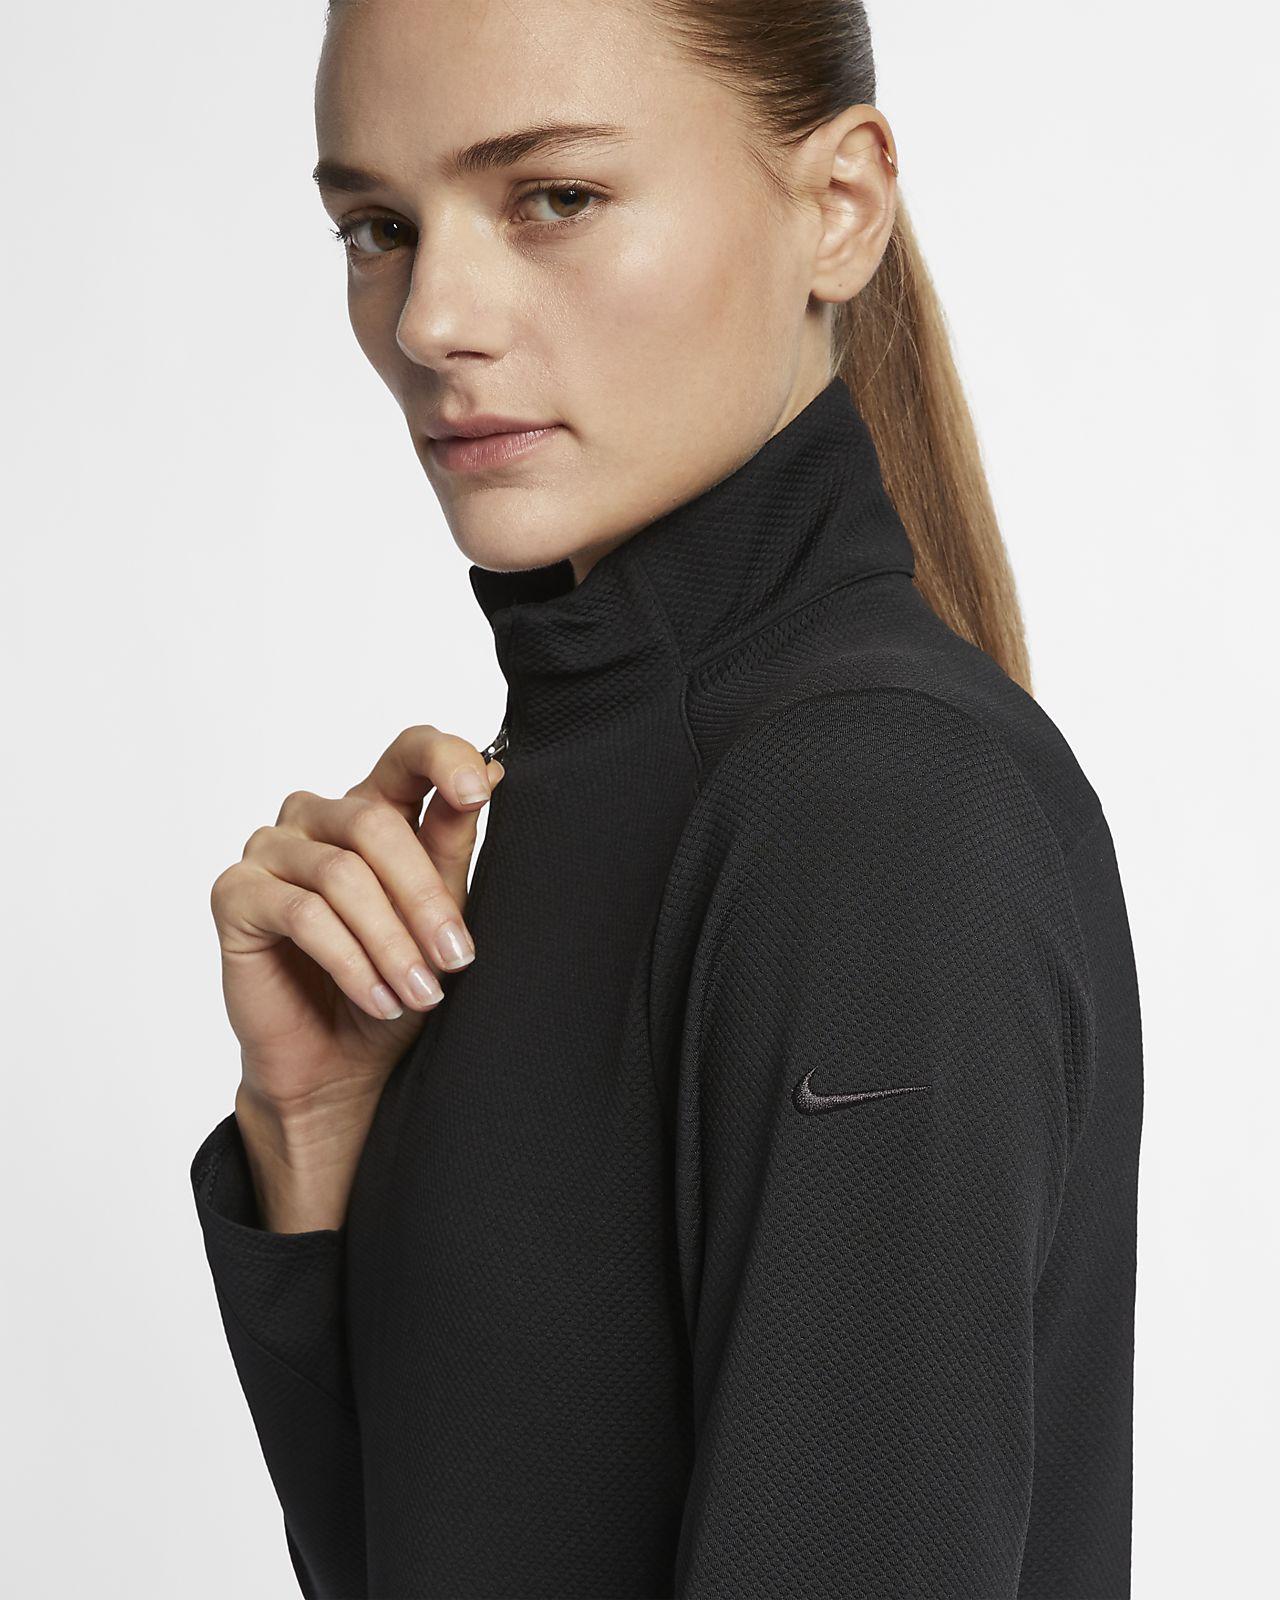 nike 1/4 zip sweatshirt womens